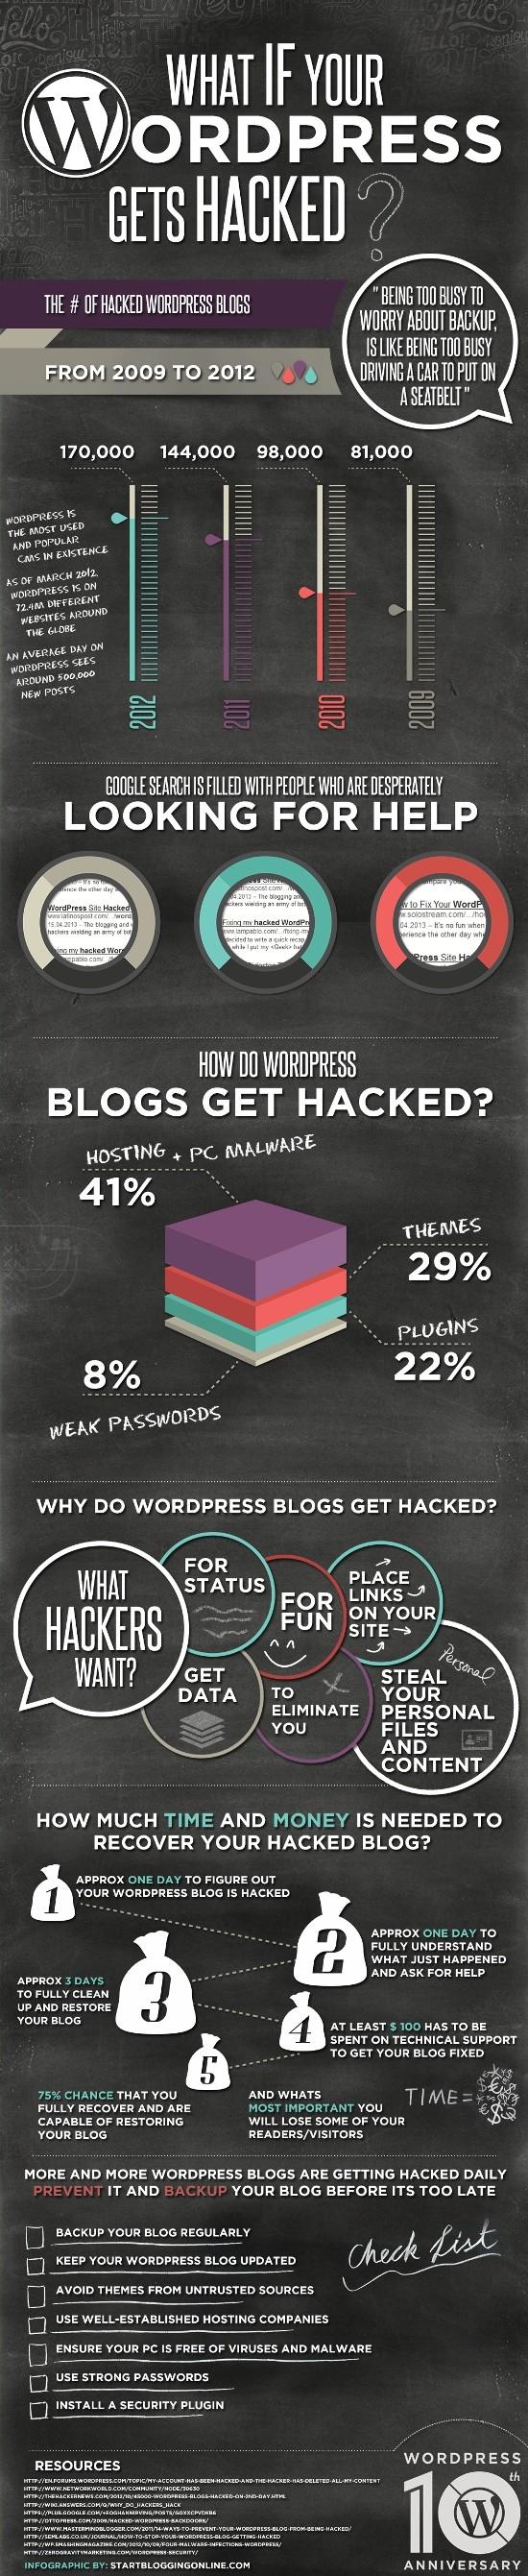 WordPress Hacked Infographic